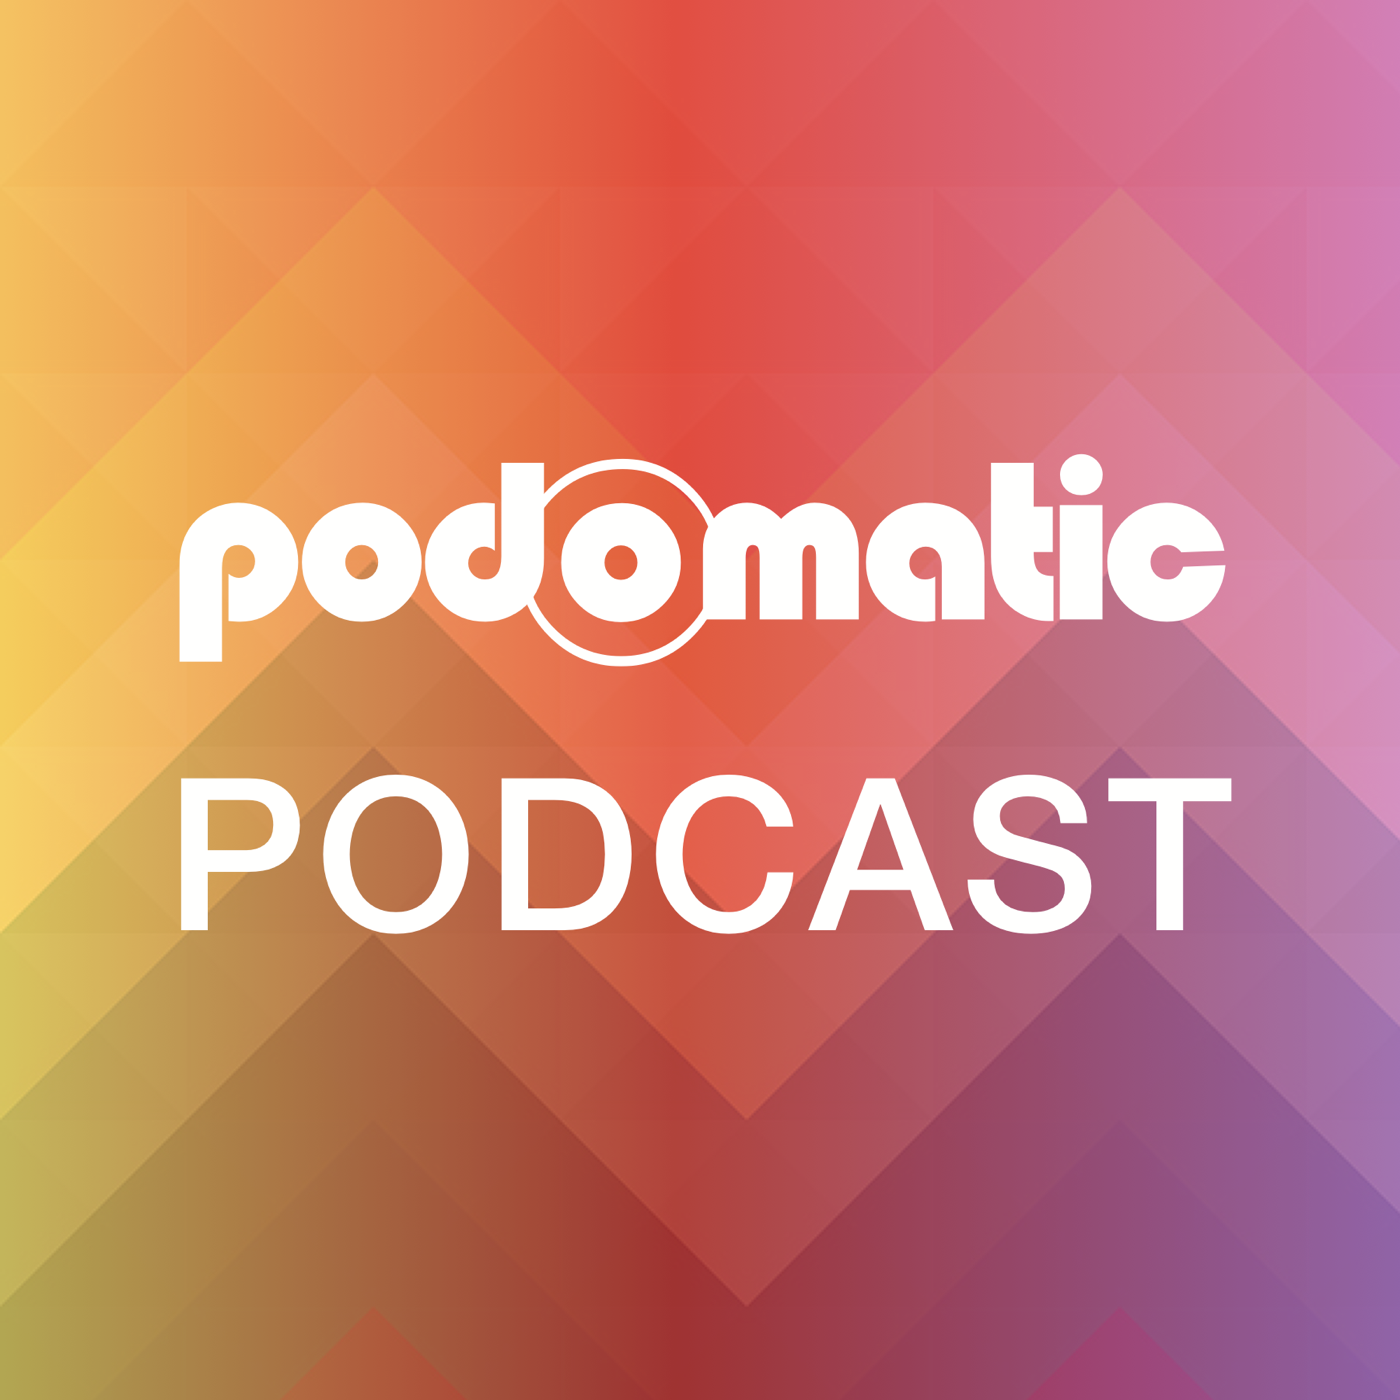 HMS Podcast